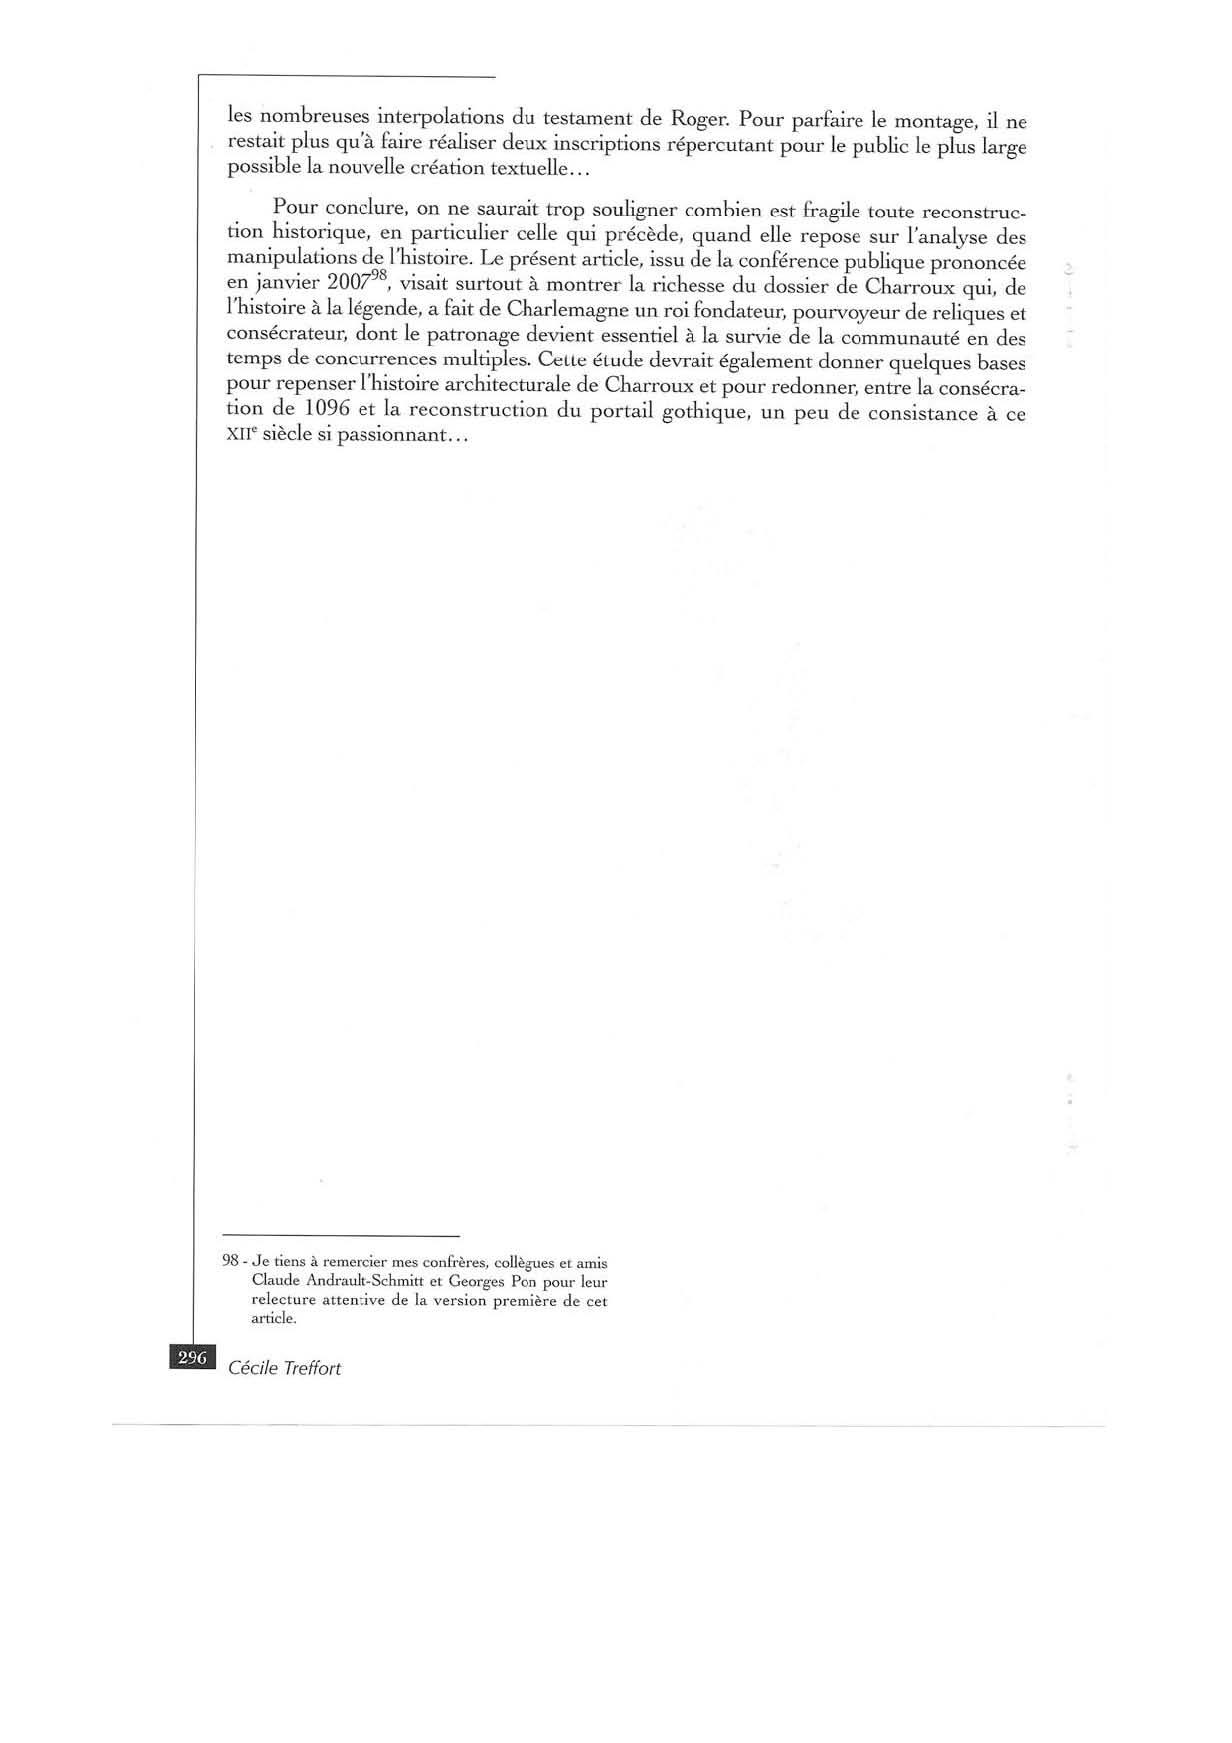 CHARLEMAGNE A CHARROUX - TREFFORT - RHCO 2007:20